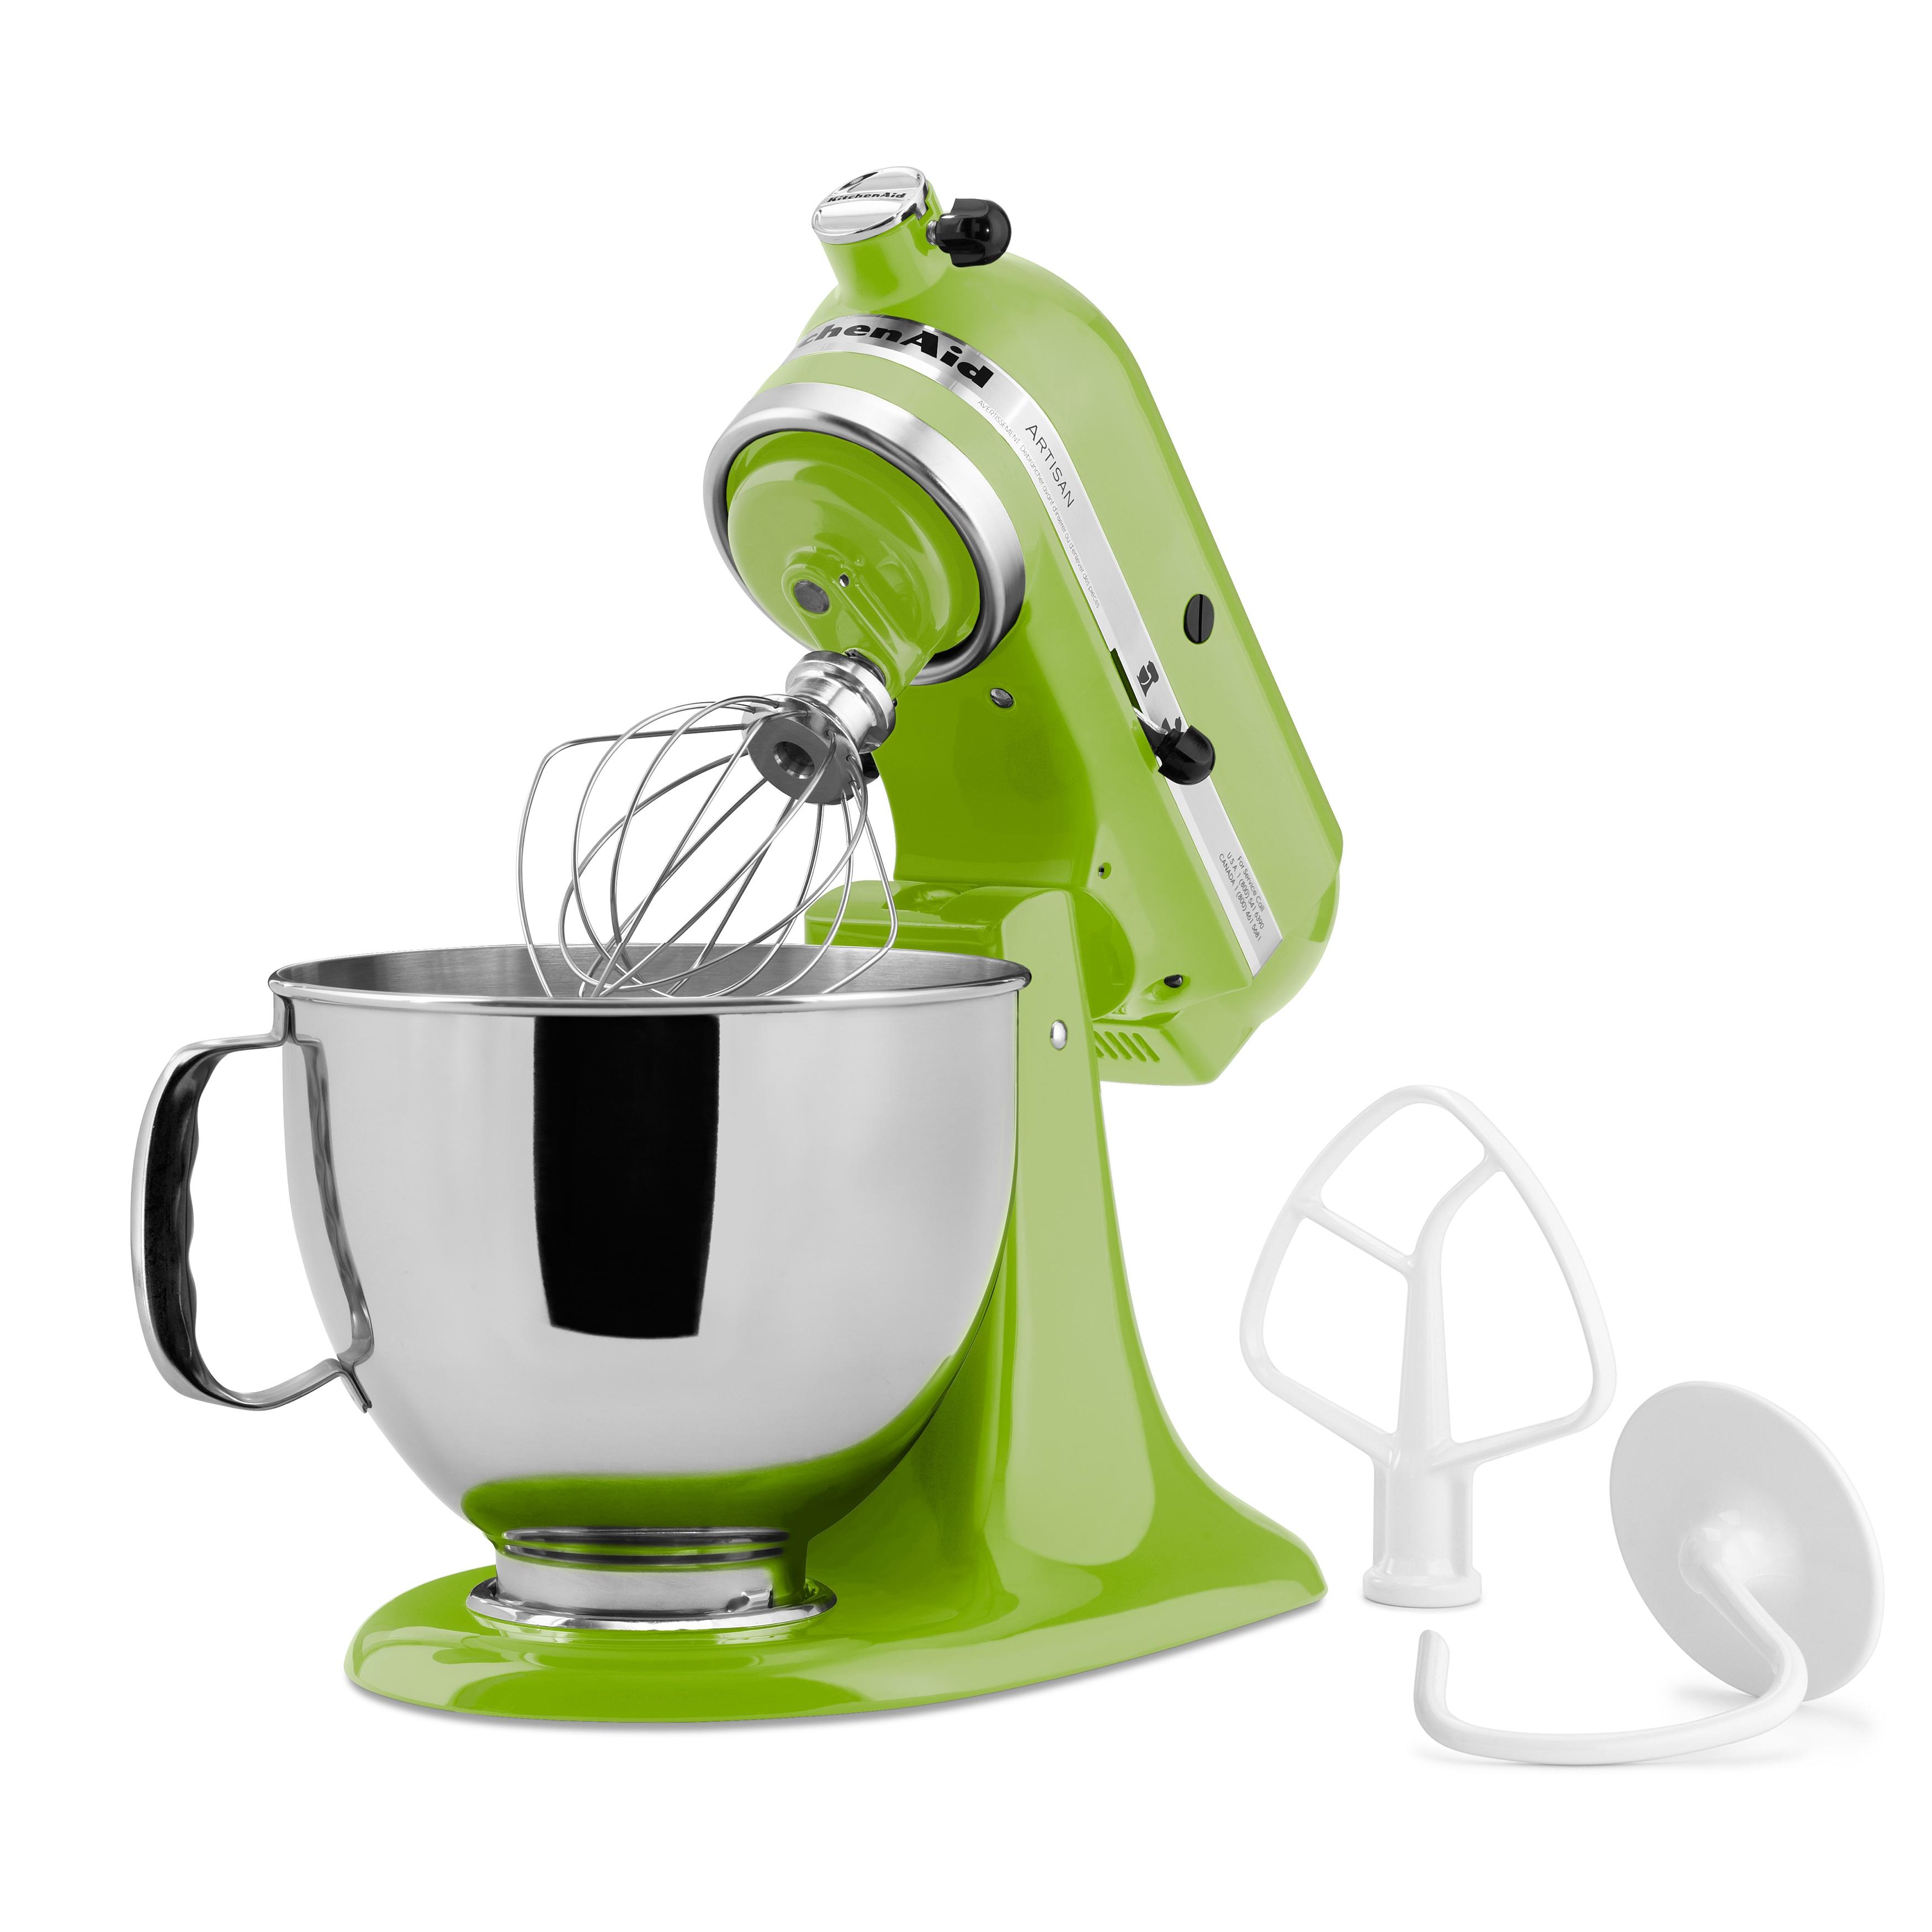 Shop KitchenAid KSM150PSGA Green Apple 5 Qt. Tilt Head Stand Mixer   Free  Shipping Today   Overstock.com   4491697